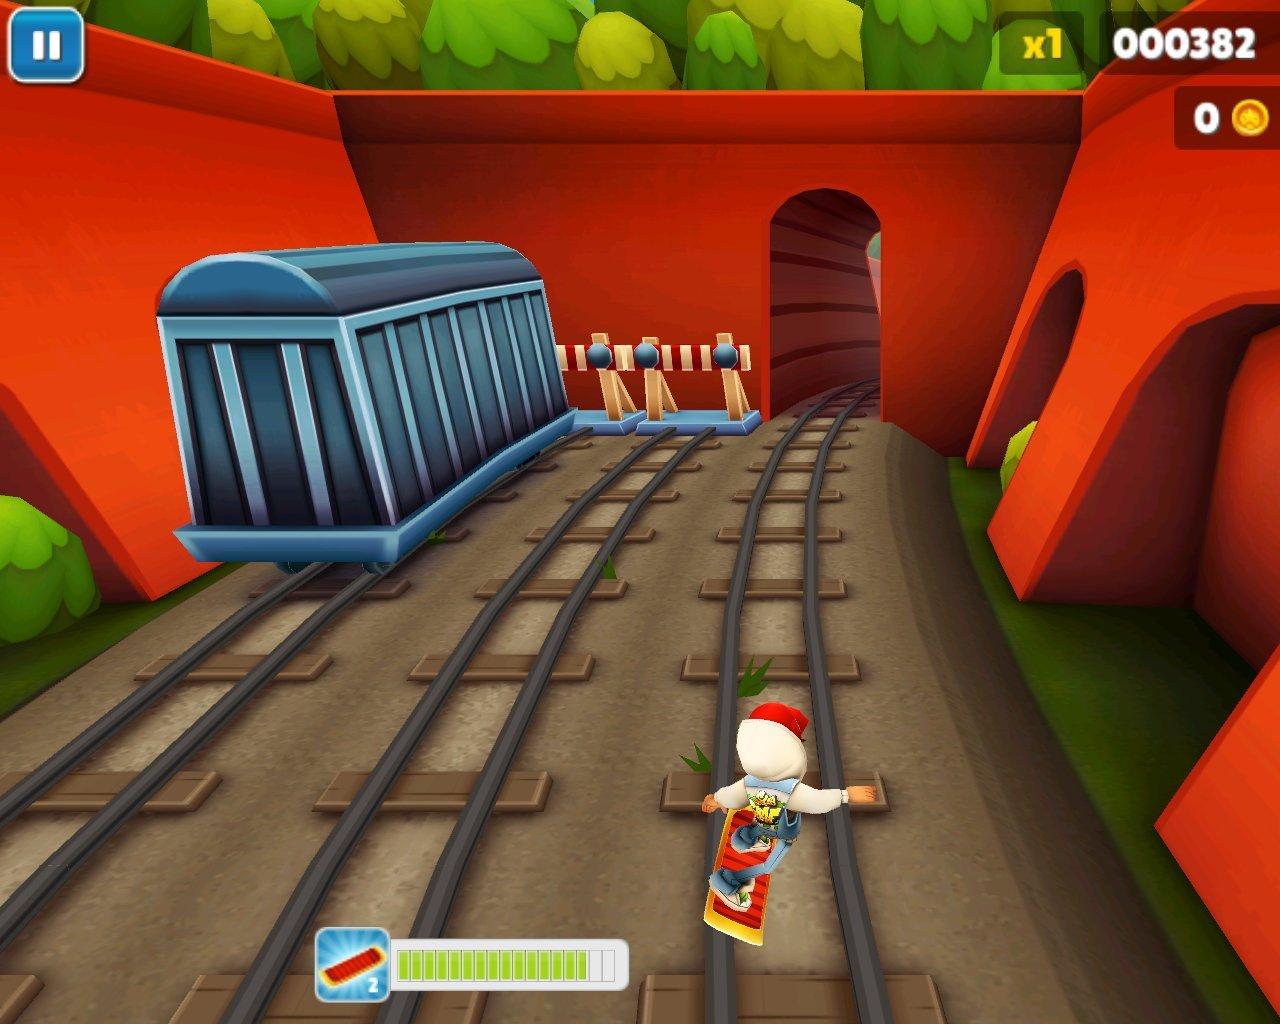 Link Download: Game Subway Surfer PC Full Version